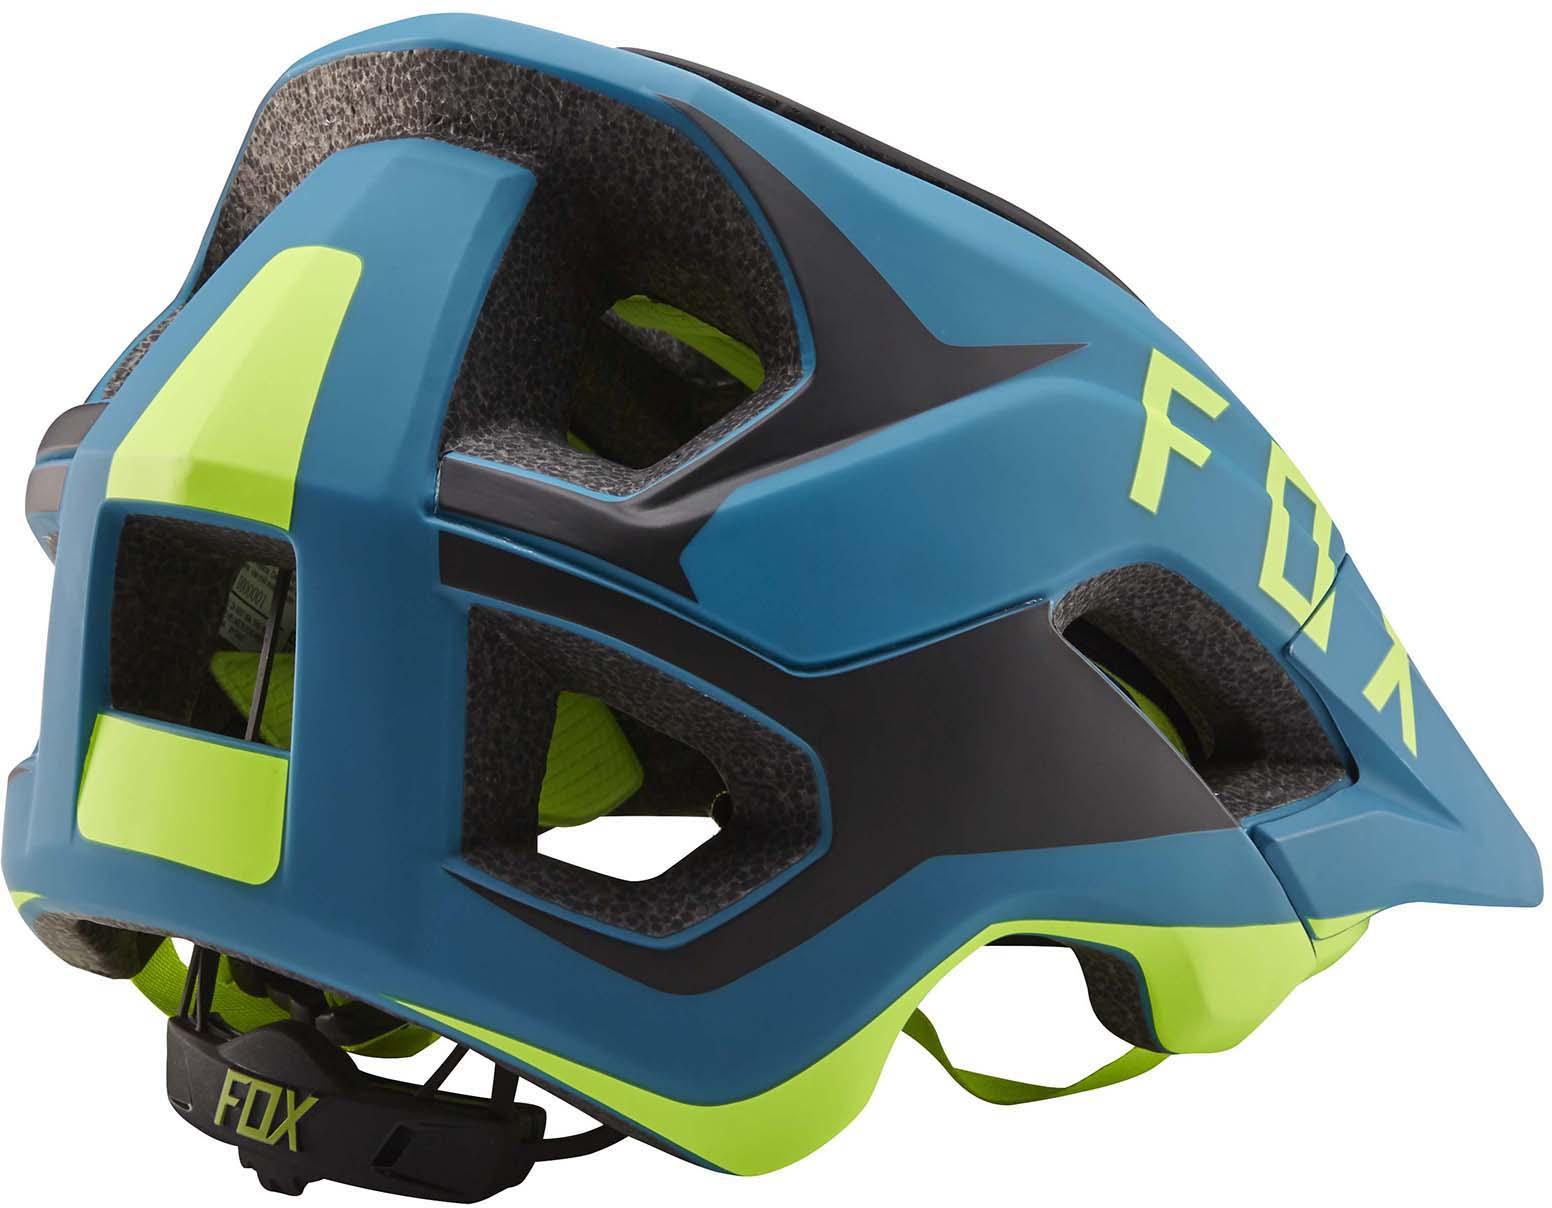 Fox Racing Metah MTB Adjustable Safety Adult Bike Helmet